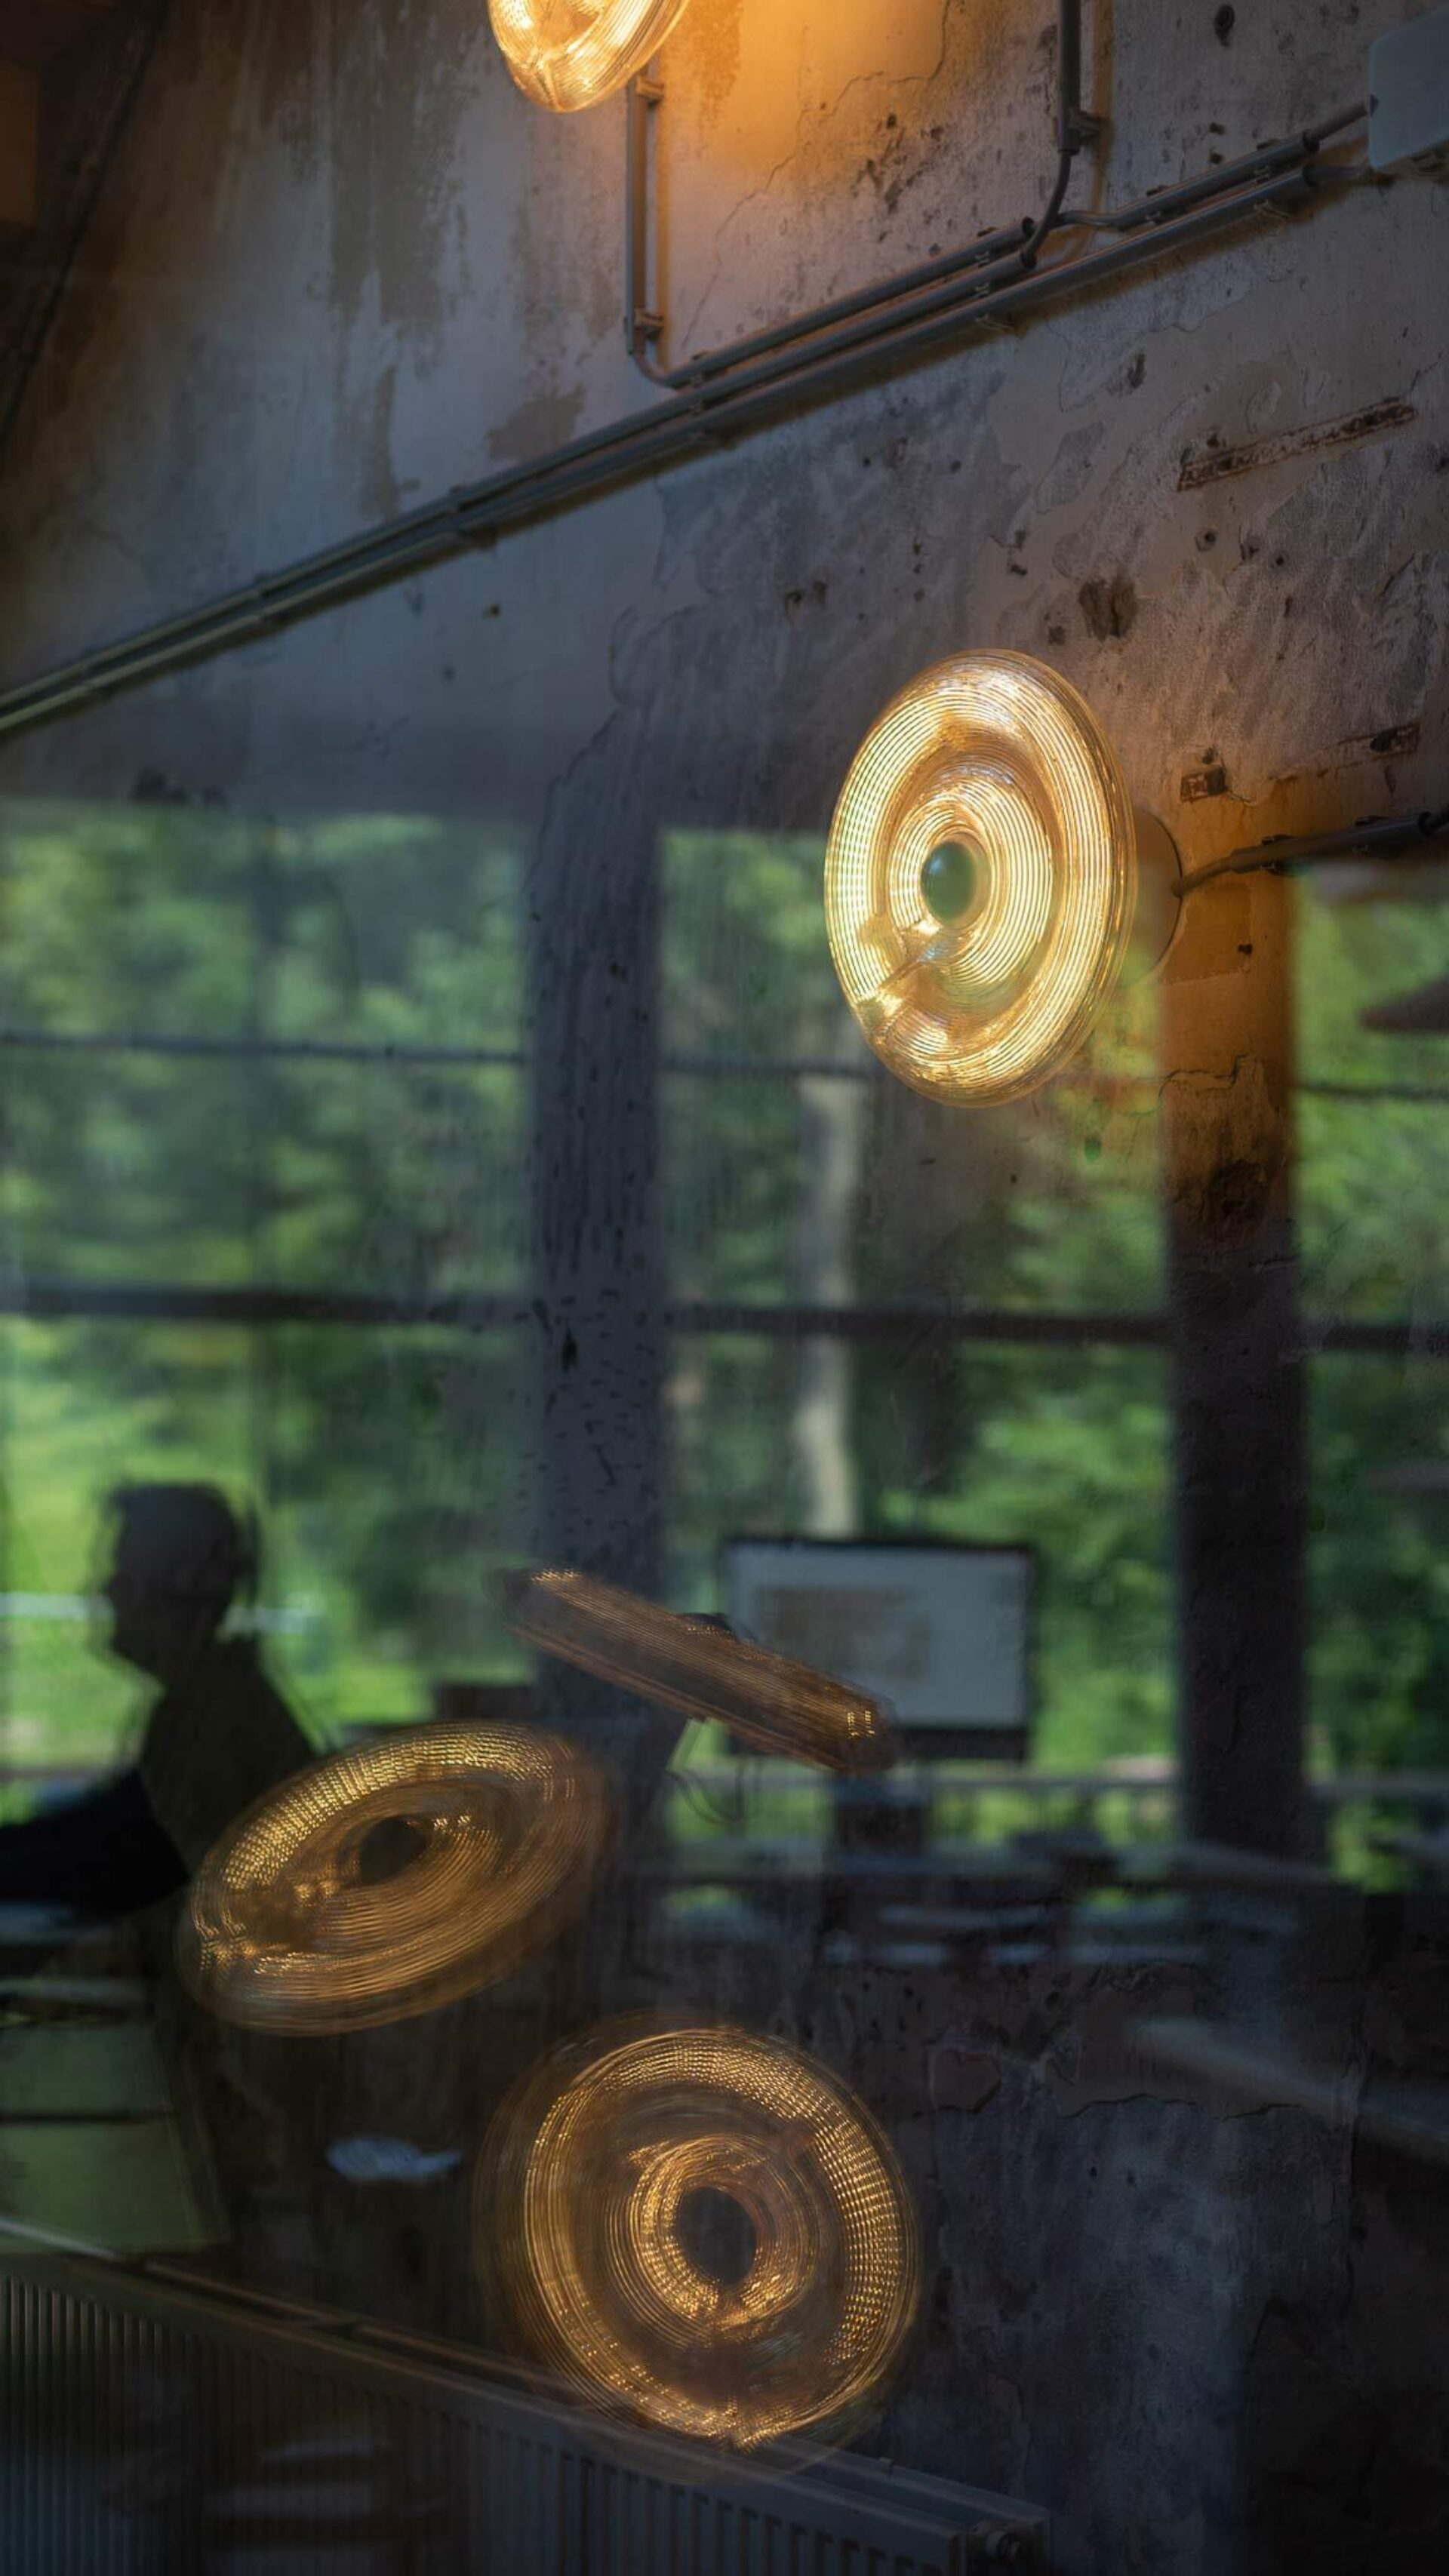 Kooij fresnel lamp studio reflection